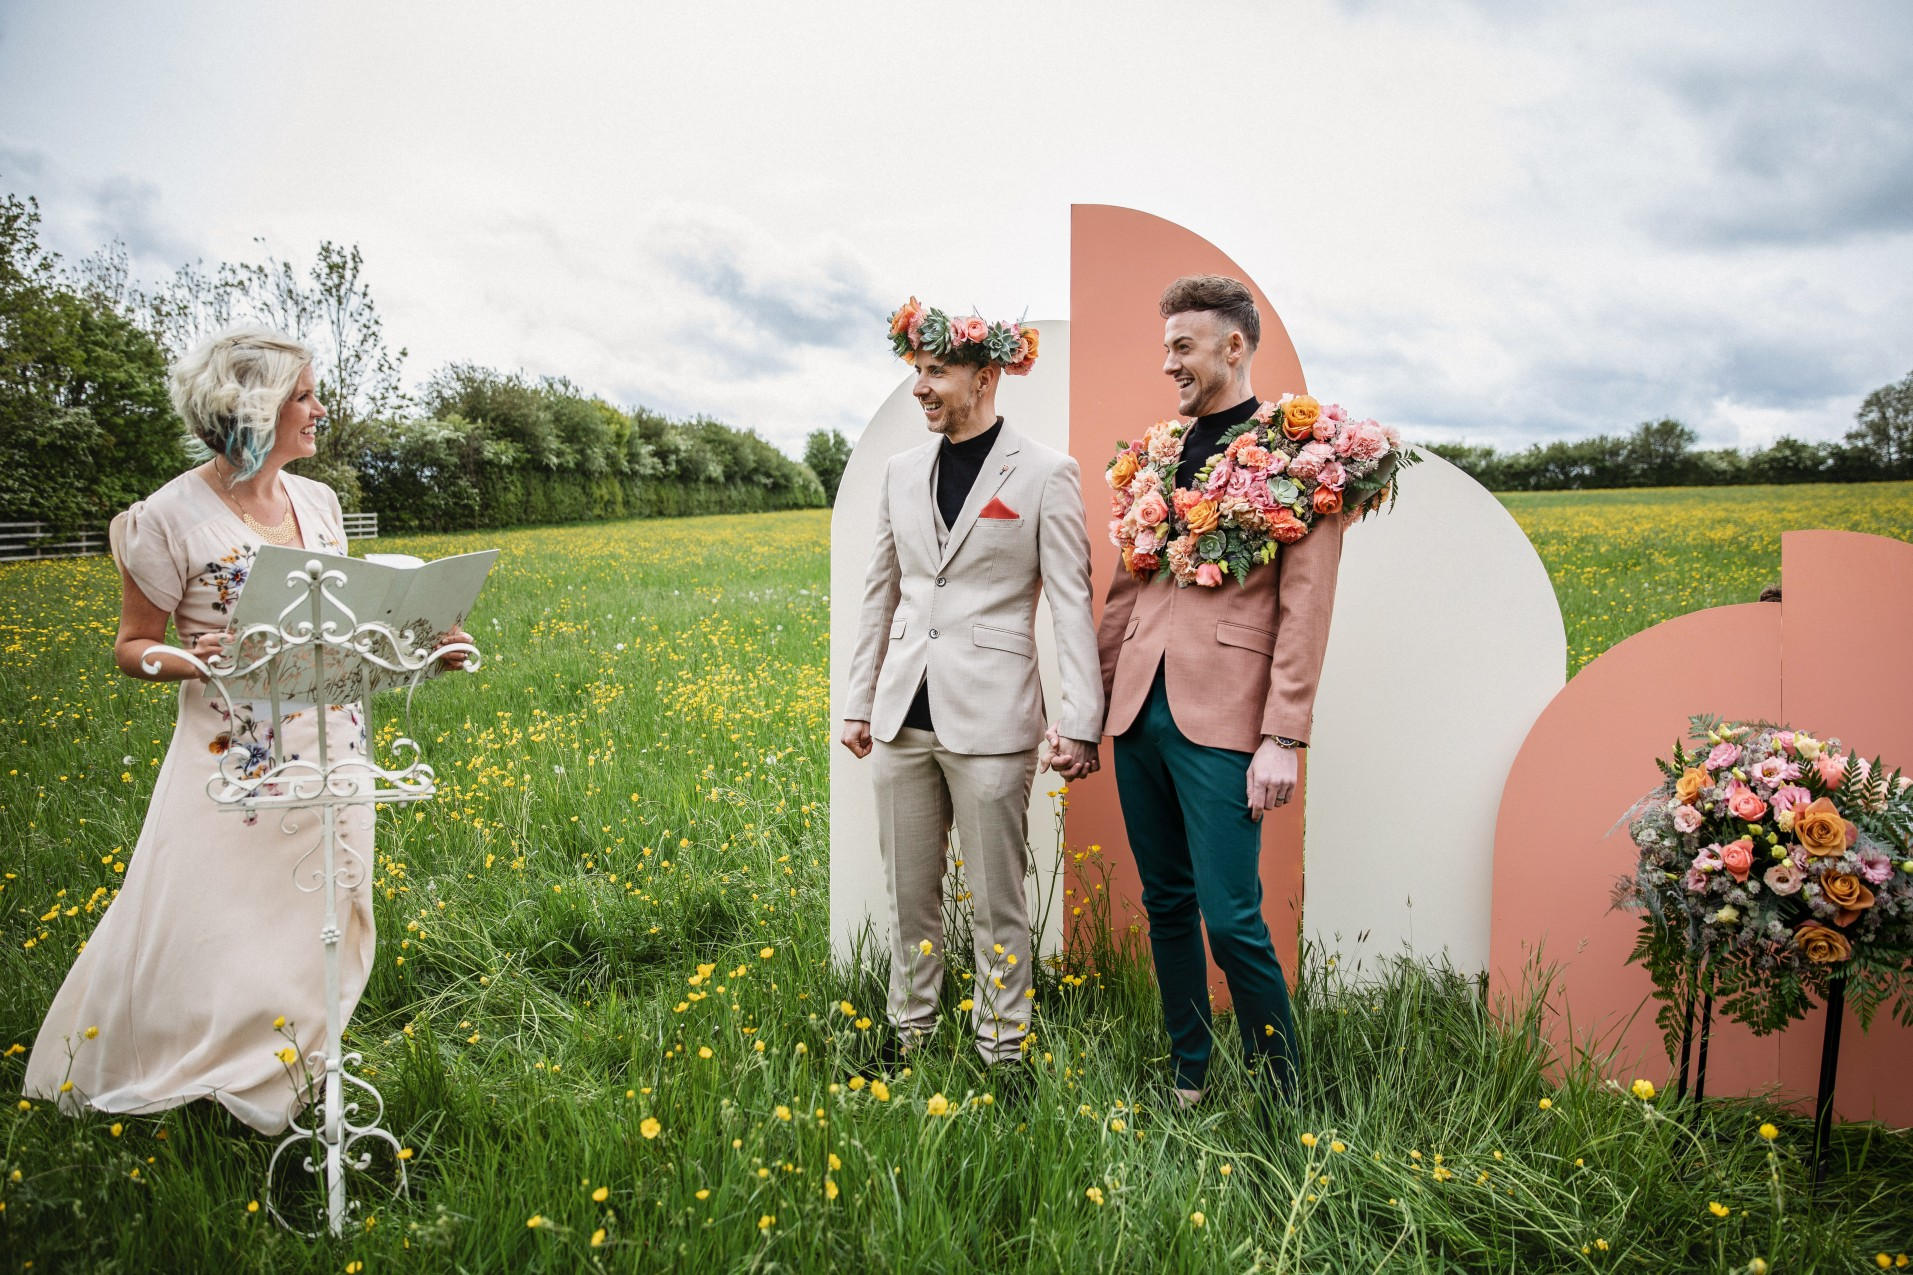 outdoor wedding ceremony - gay celebrant ceremony - gay wedding ideas - retro wedding backdrop - grooms style ideas - colourful grooms suit